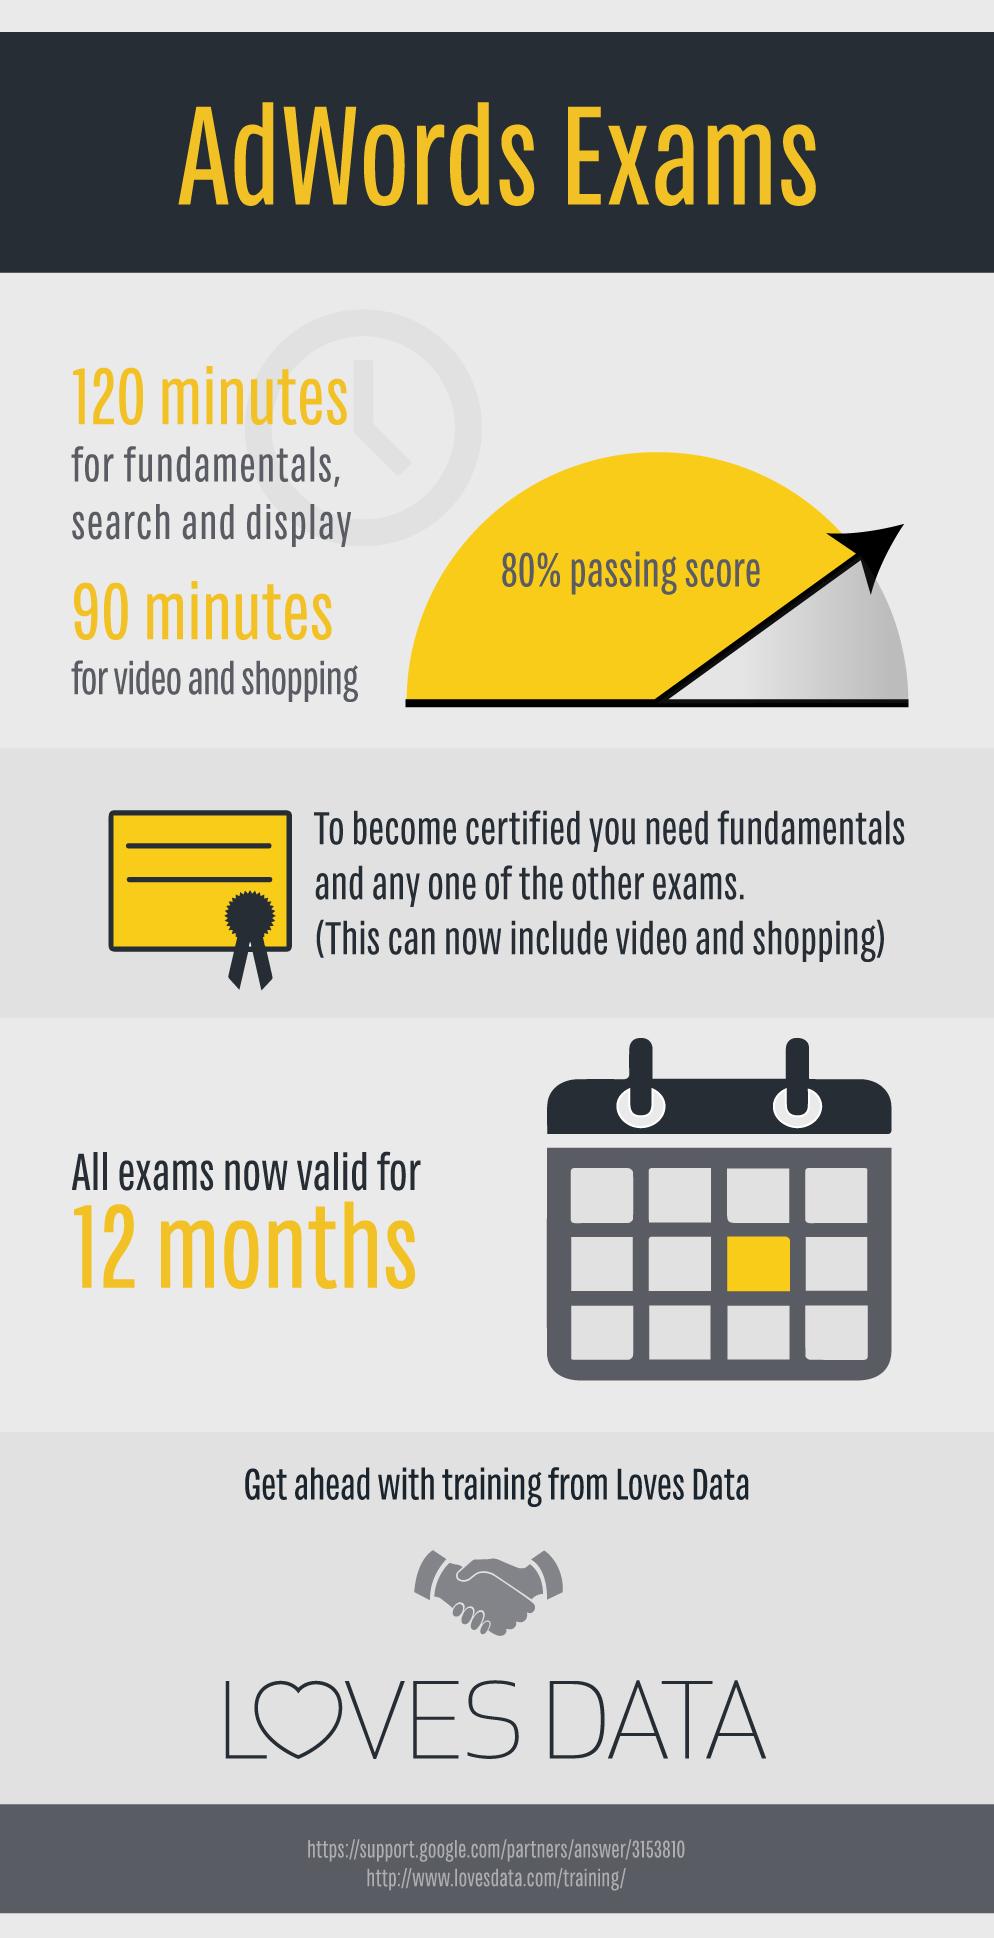 ADWORDS-EXAMS-infographic-lovesdata